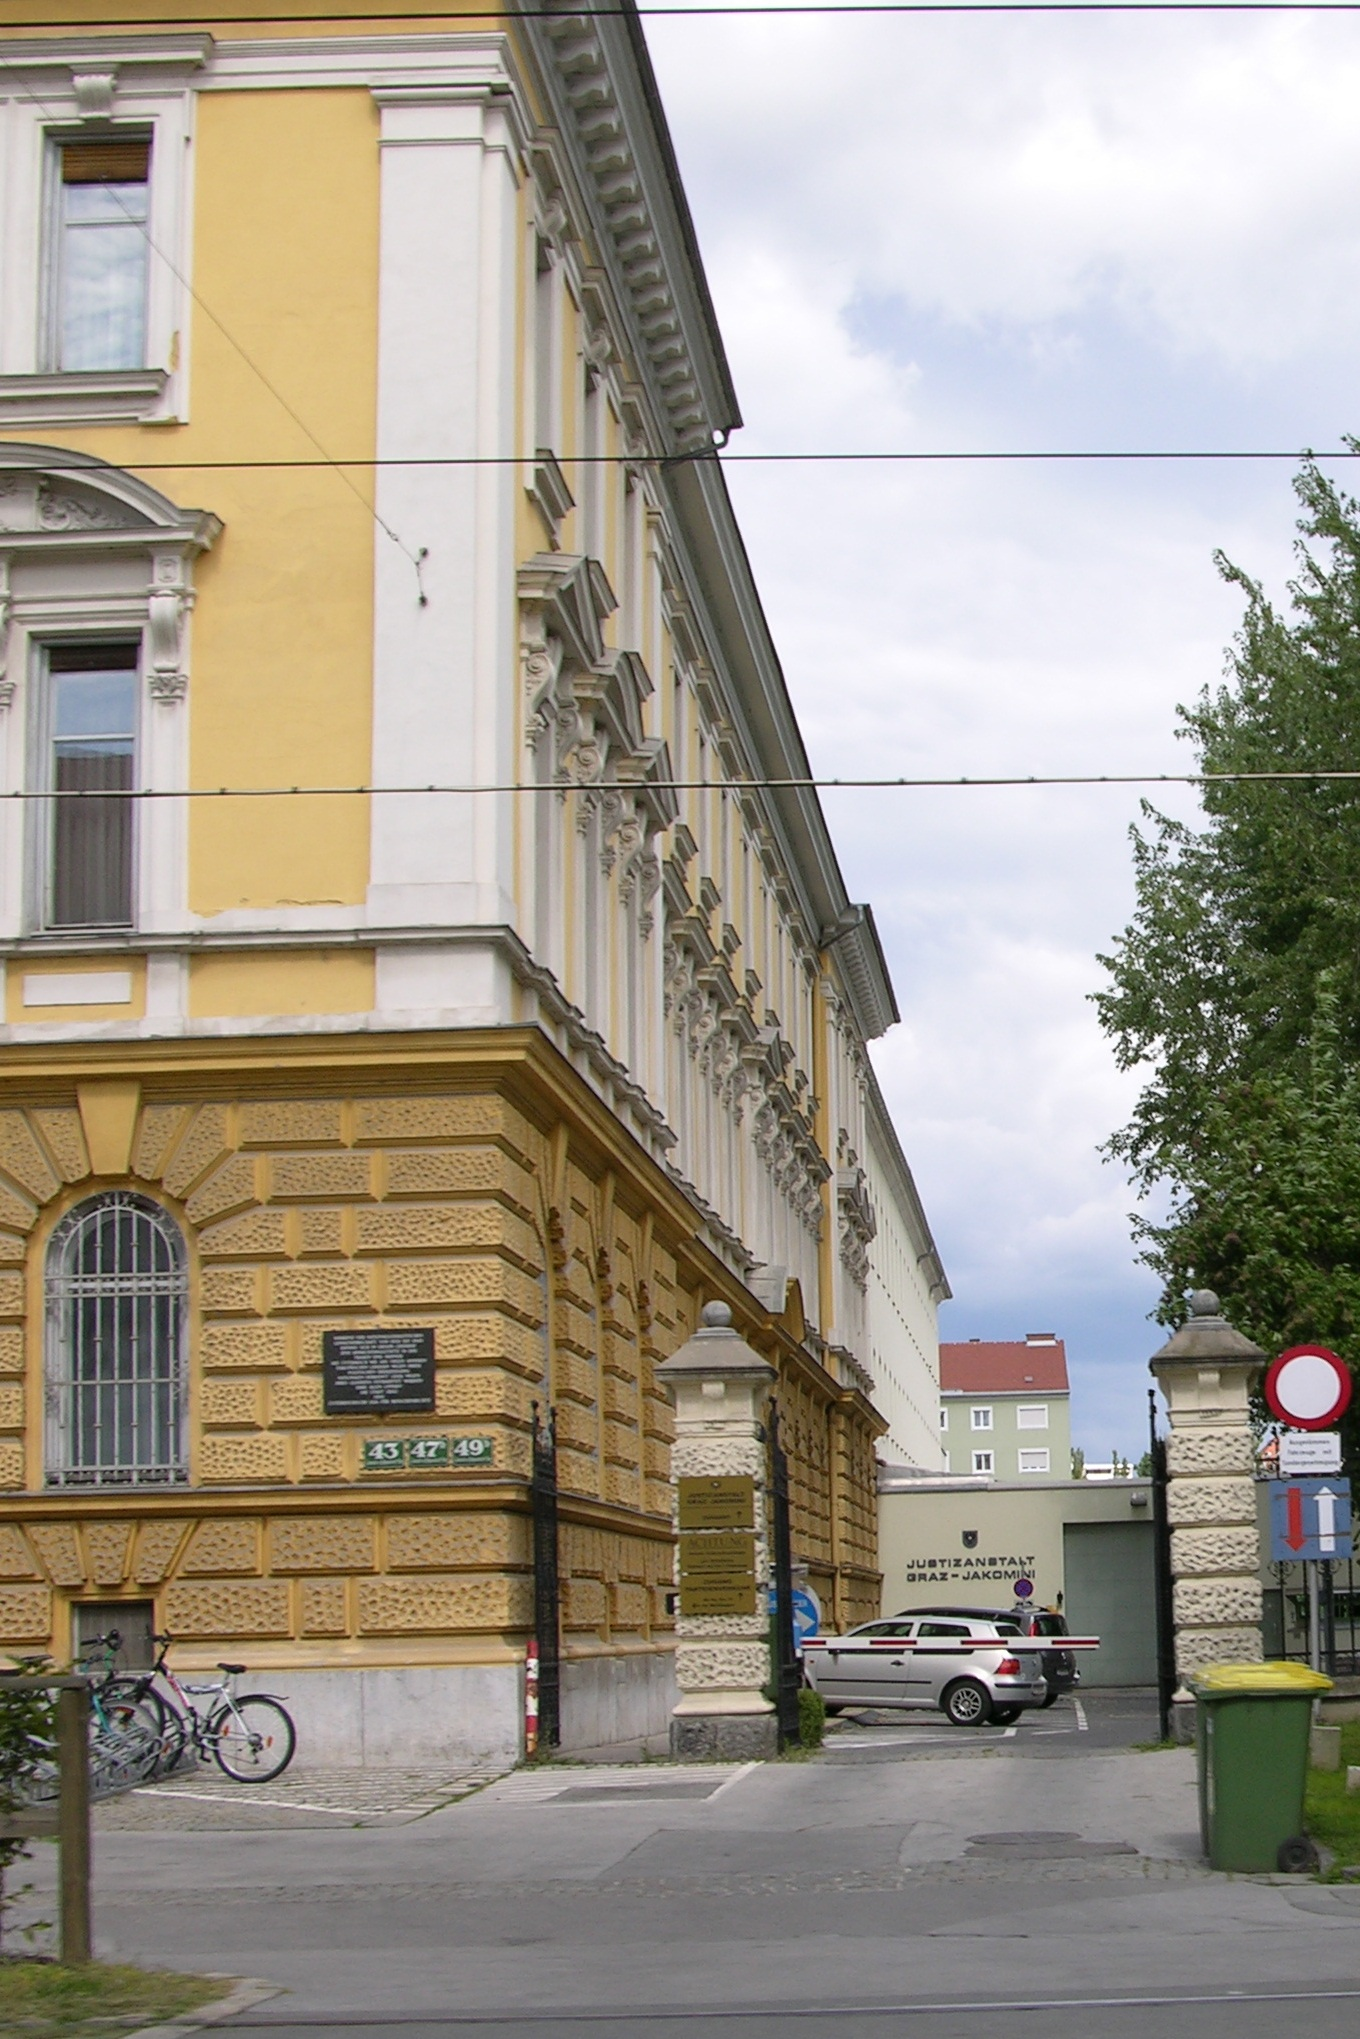 Liebe Flirt Graz Jakomini - suche beziehung Graz Waltendorf